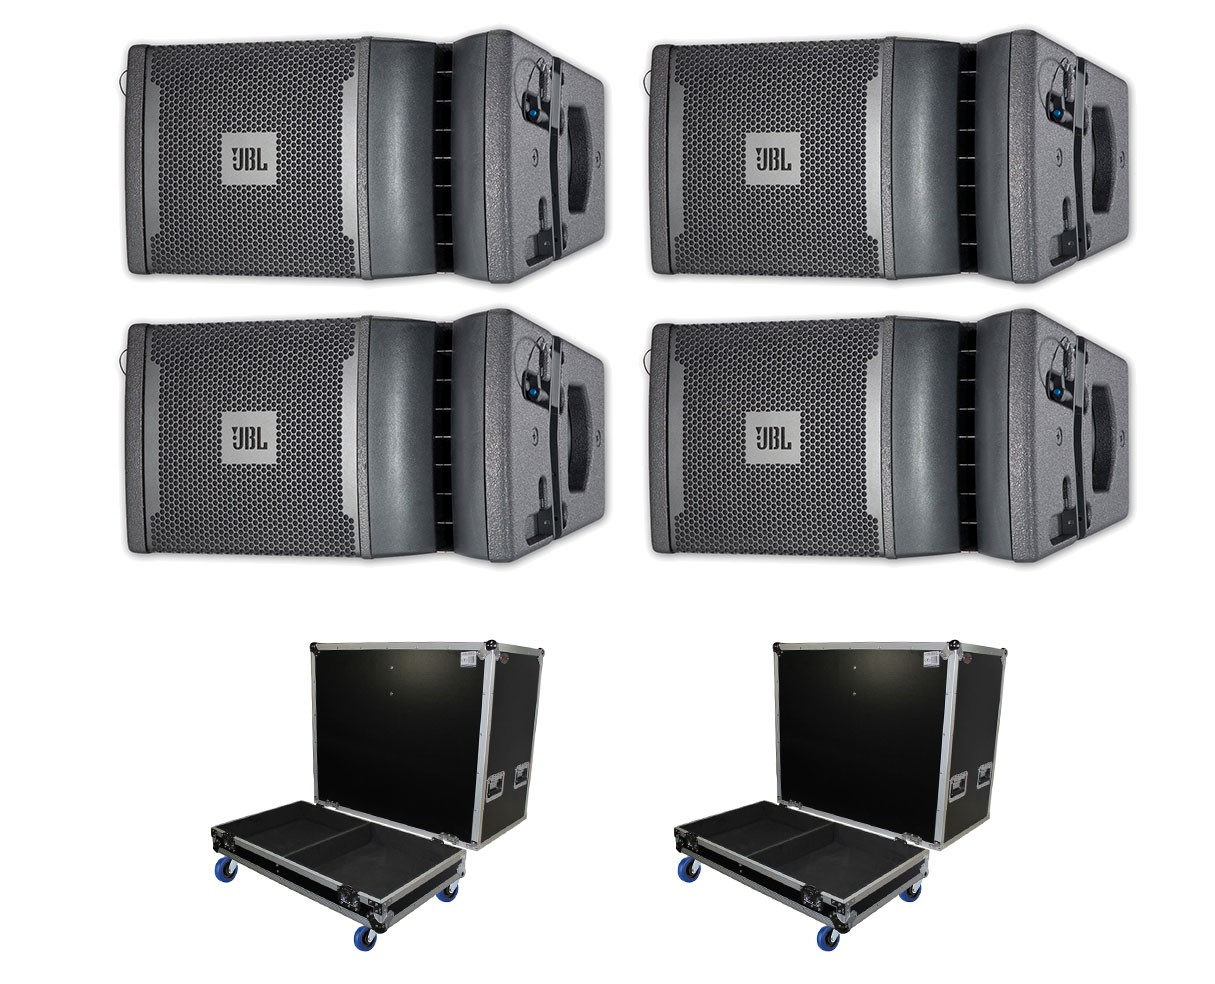 4x JBL VRX932LAP + ATA Cases